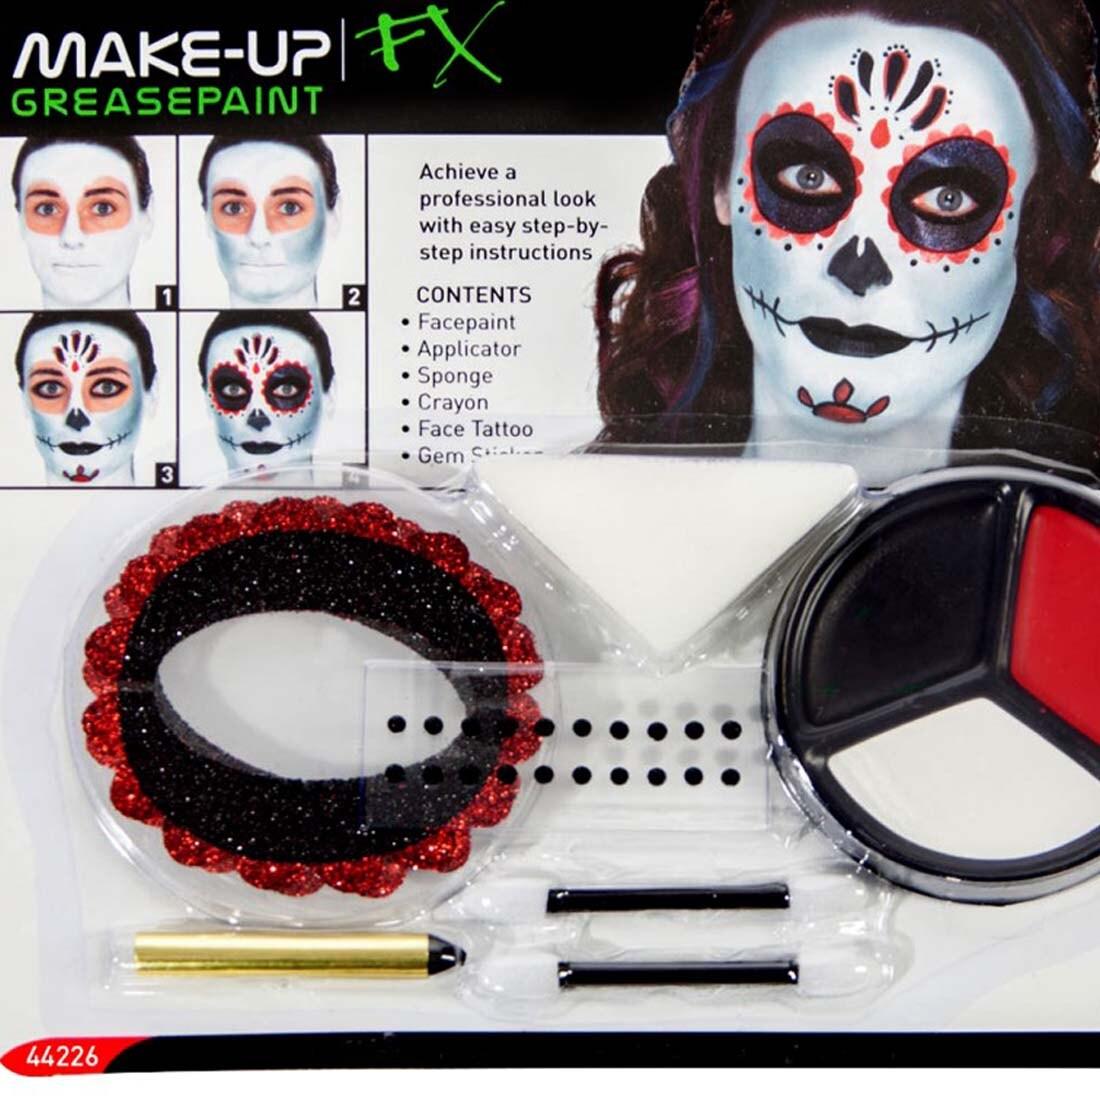 Schminke mexikanische totenmaske sugar skull makeup set mehrteilig 7 49 - Mexikanische totenmaske schminken ...